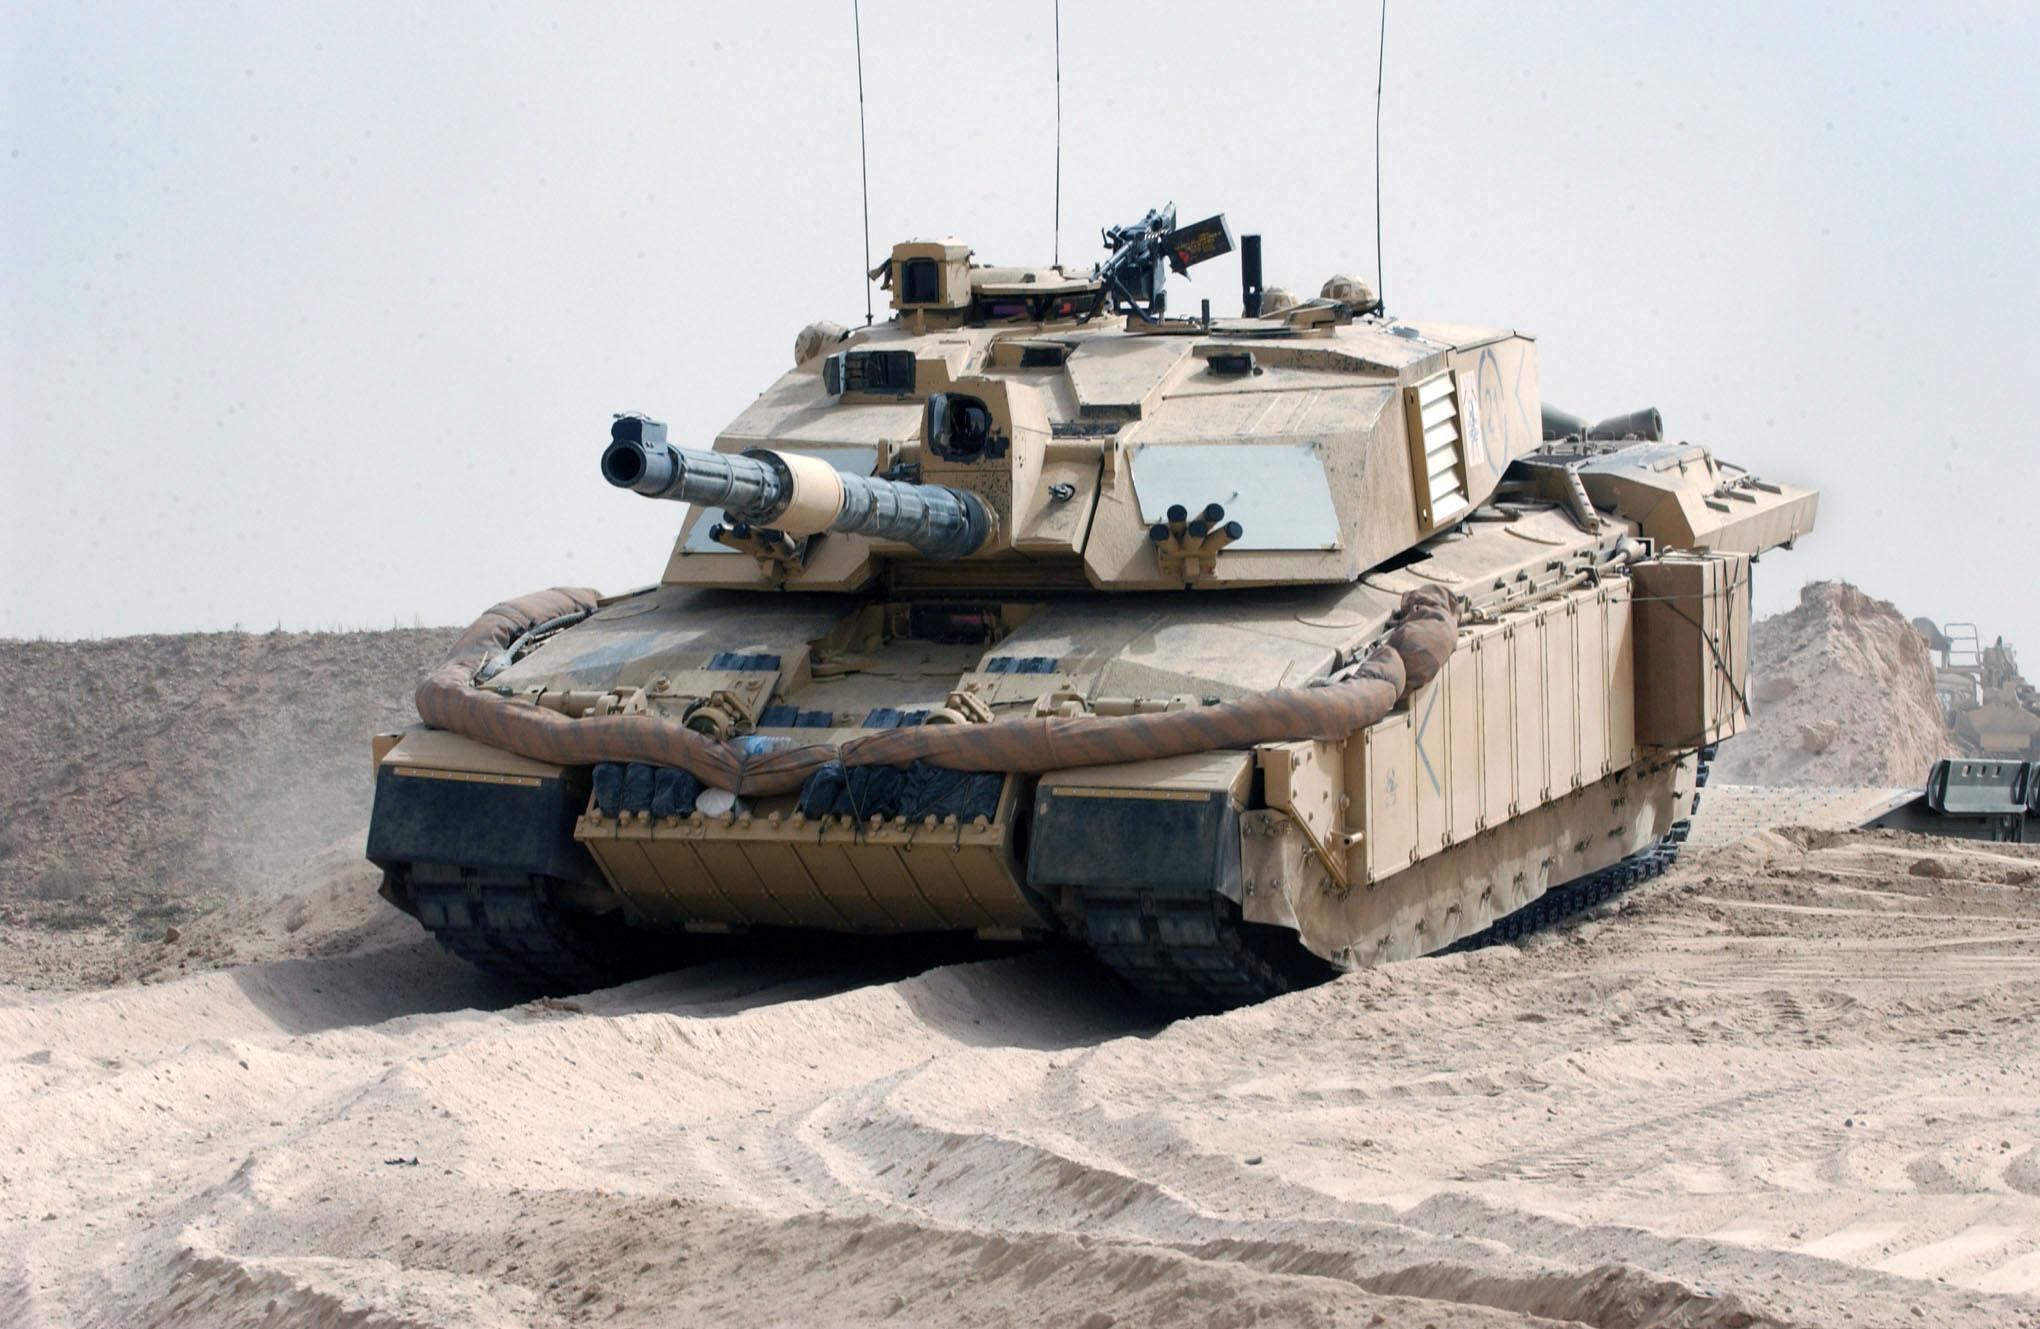 Challenger II image - Tank Lovers Group - Mod DB: www.moddb.com/groups/tanks/images/challenger-ii2